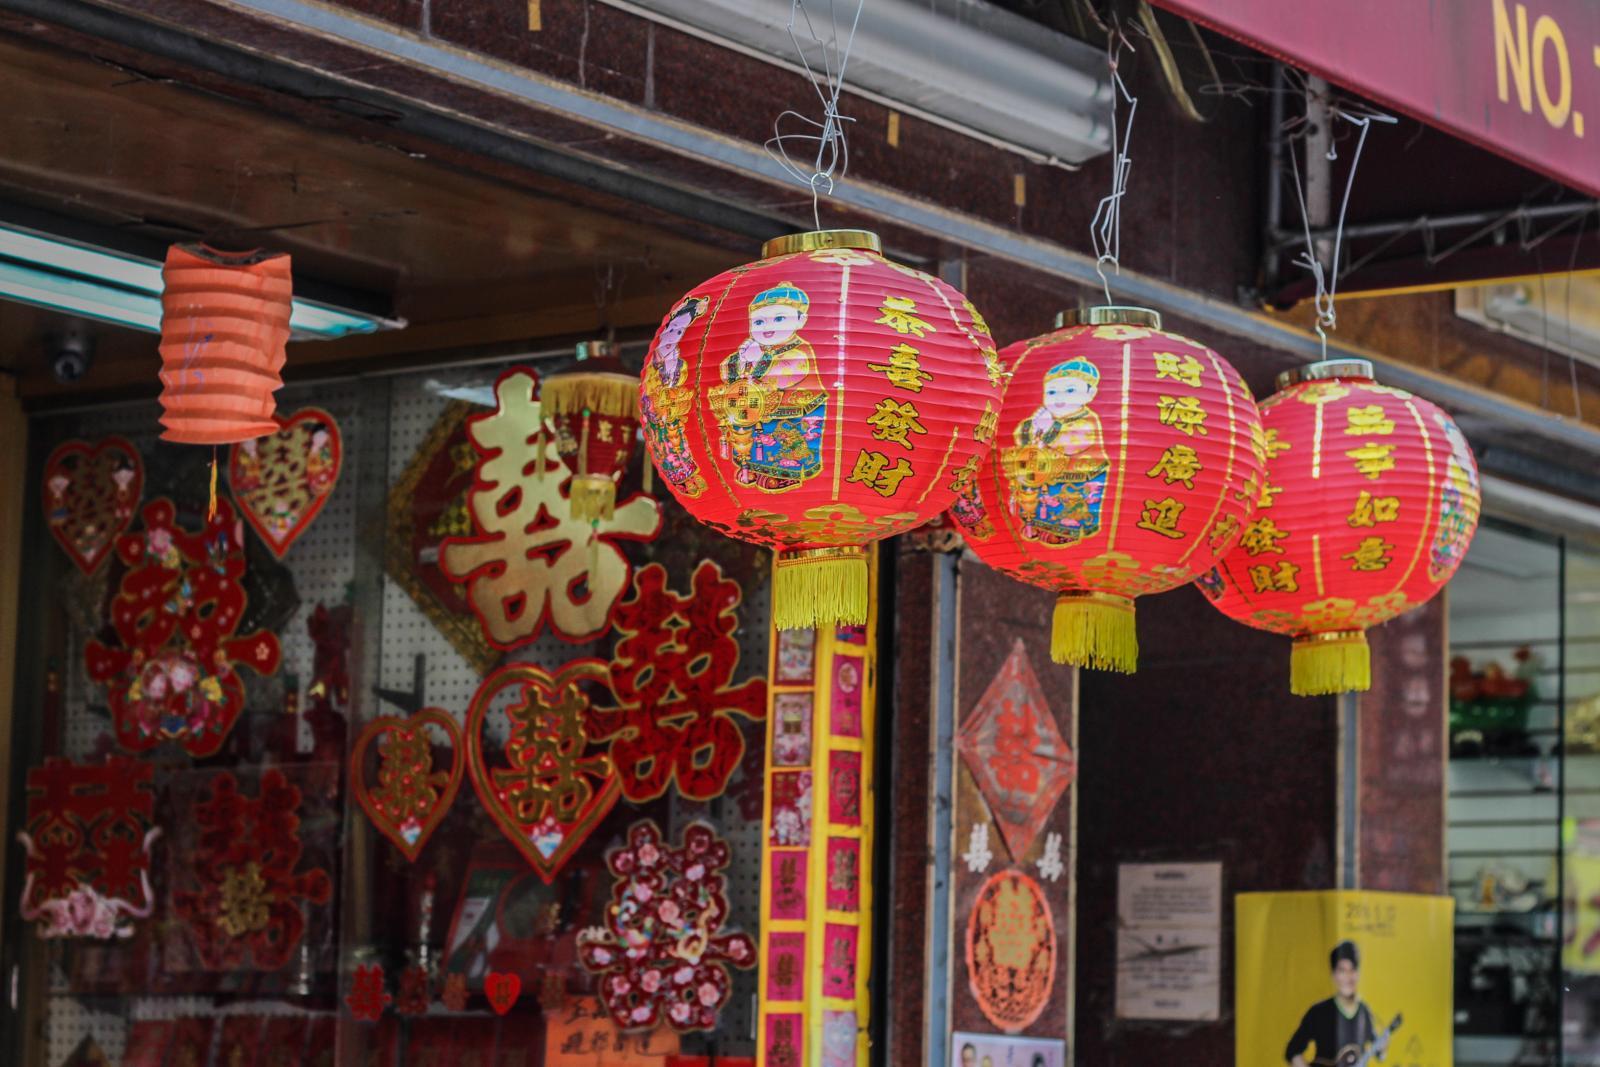 chinatown-nueva-york-161019174958003